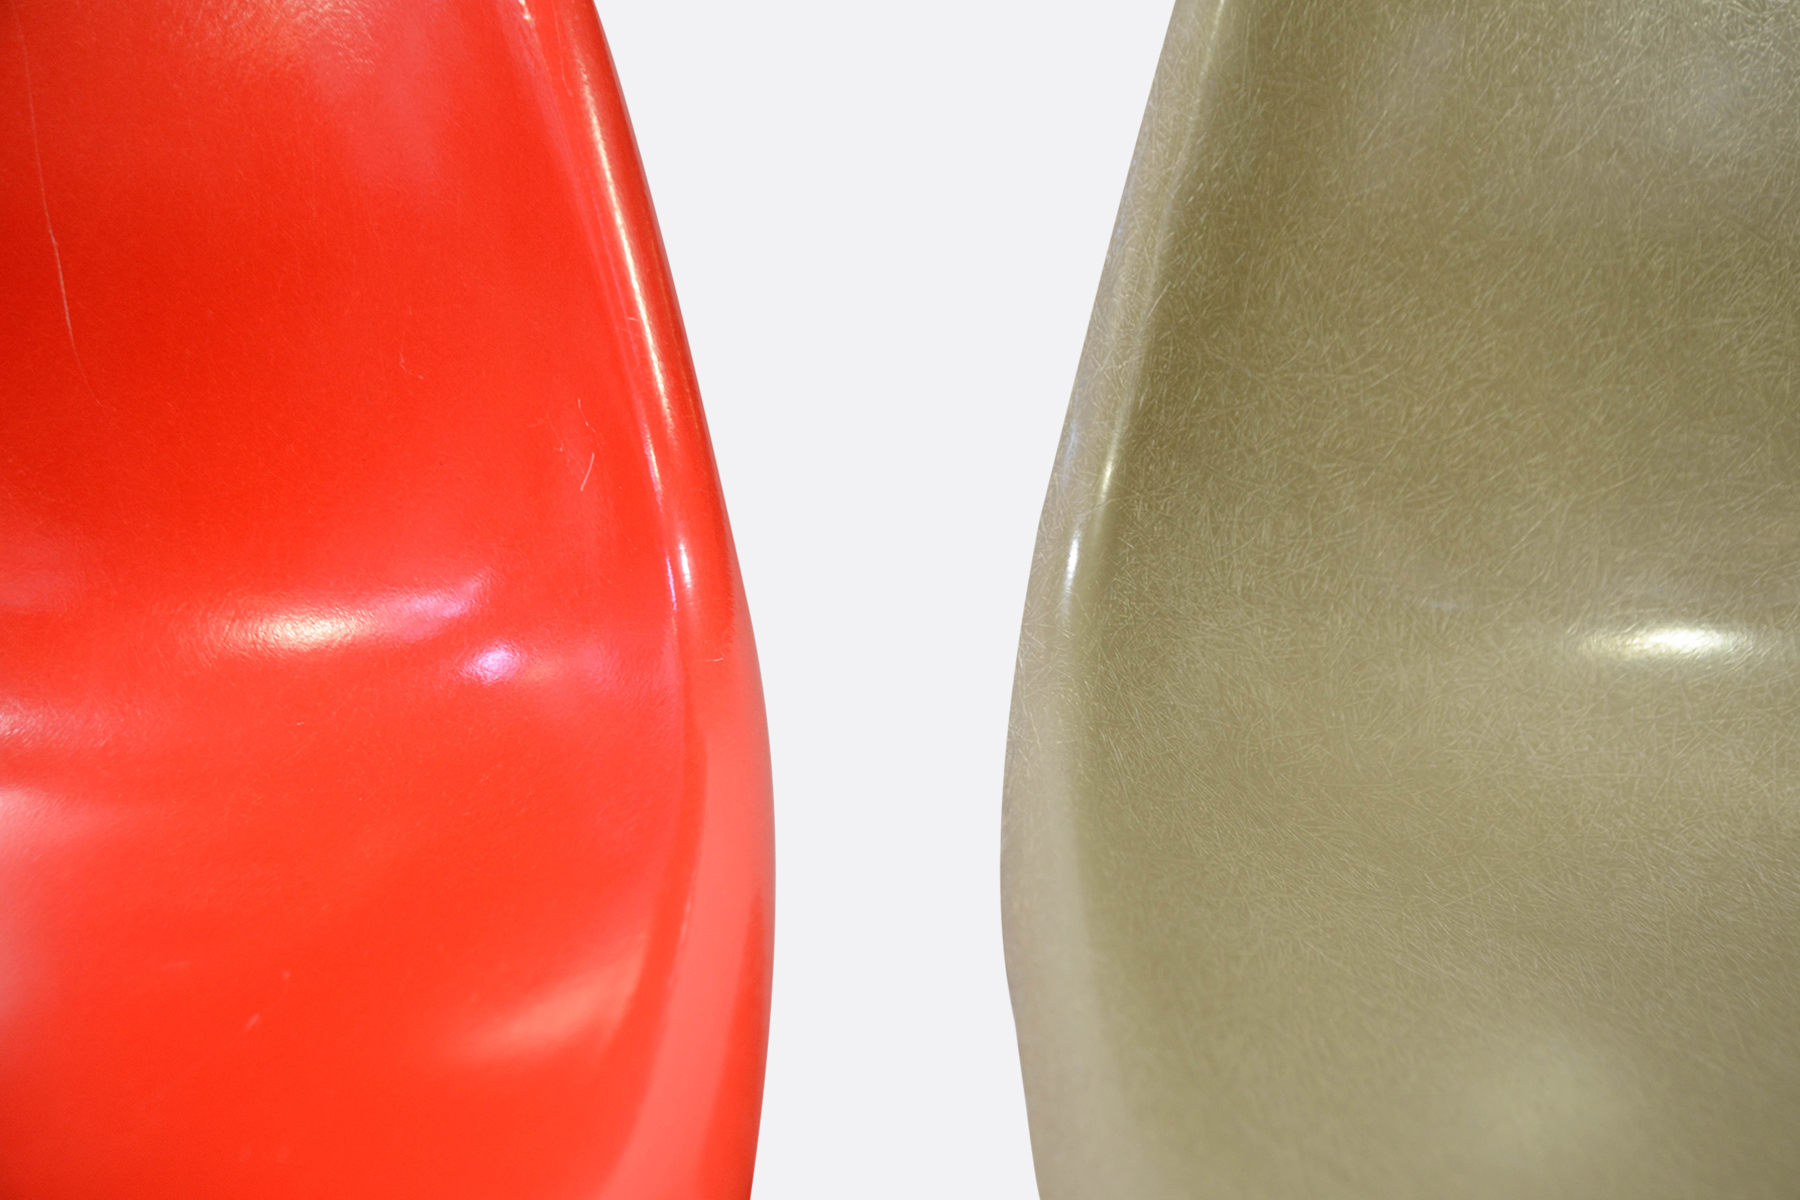 set-of-4-red-raw-detail